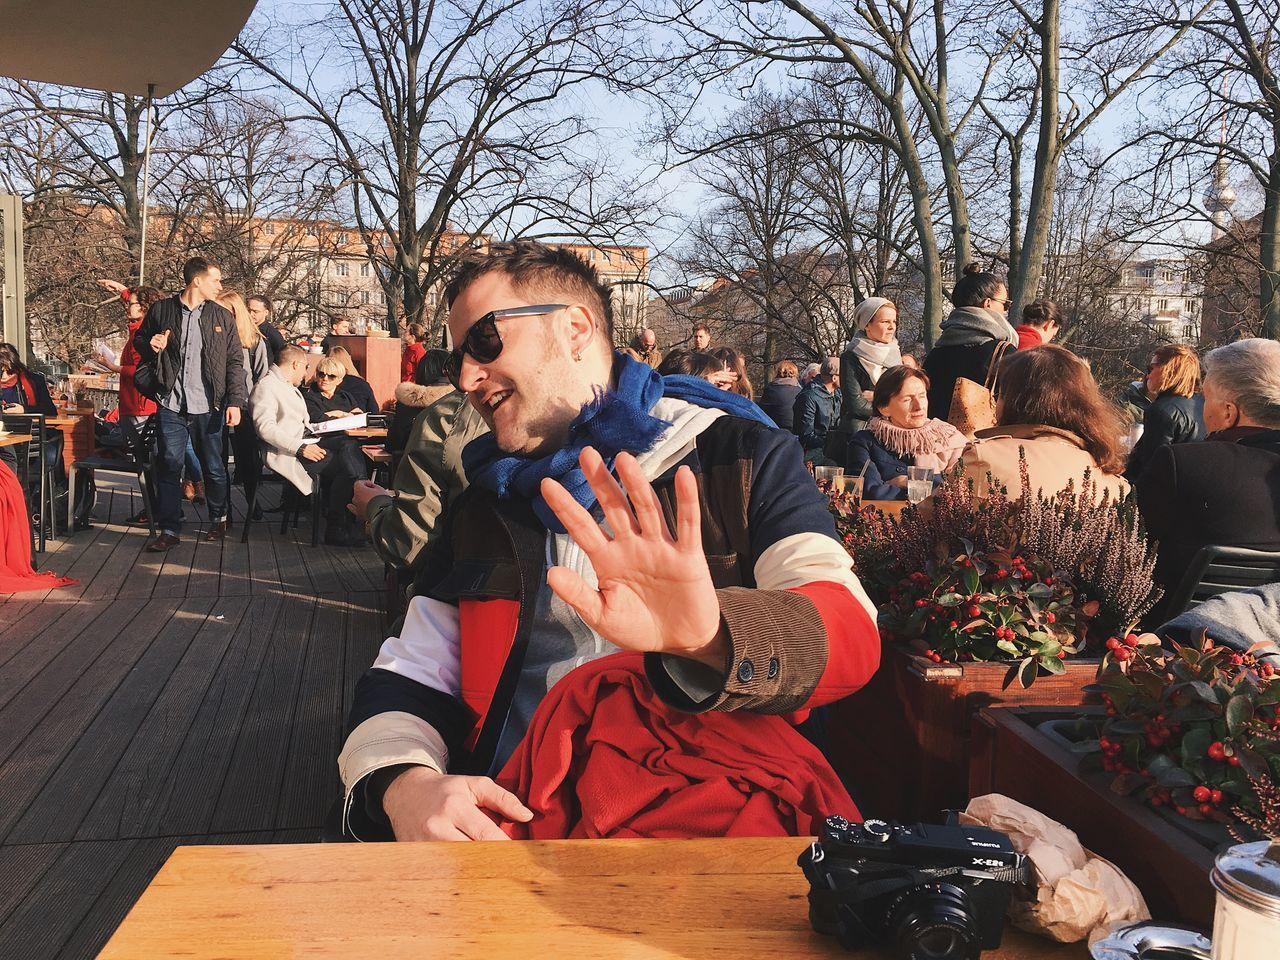 no photos pls Casual Clothing Human Hand Outdoors Restaurant Smiling Sunglasses